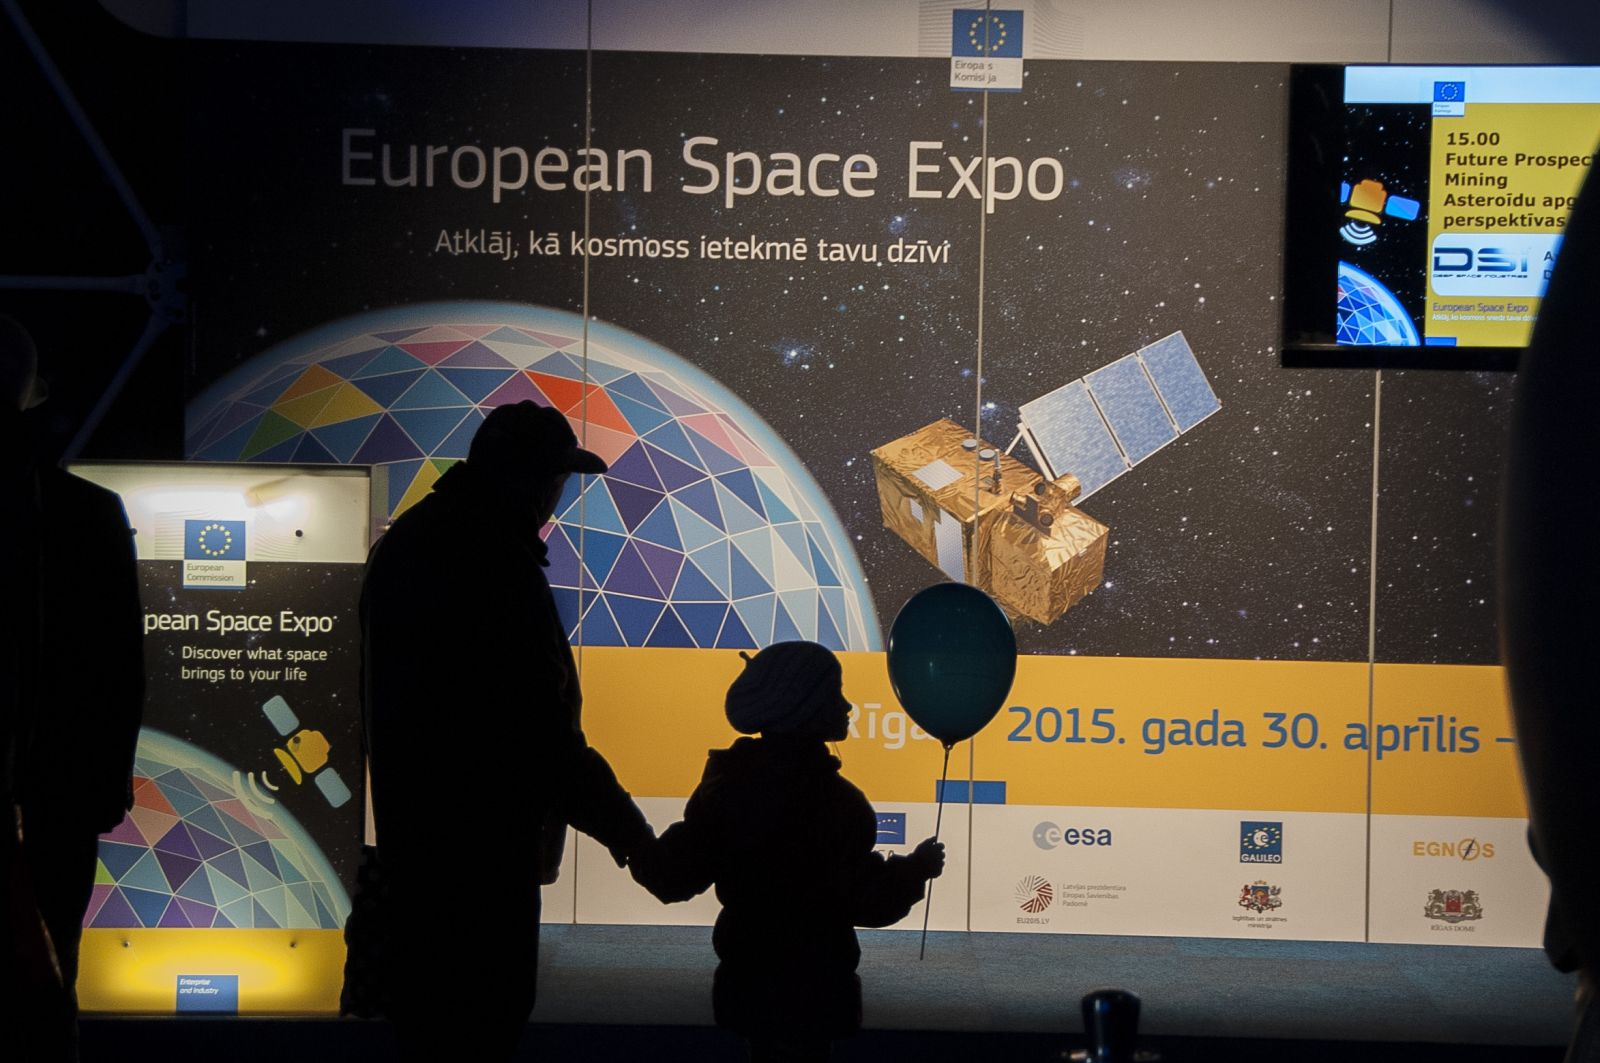 European Space Expo exhibition in Ekspanade